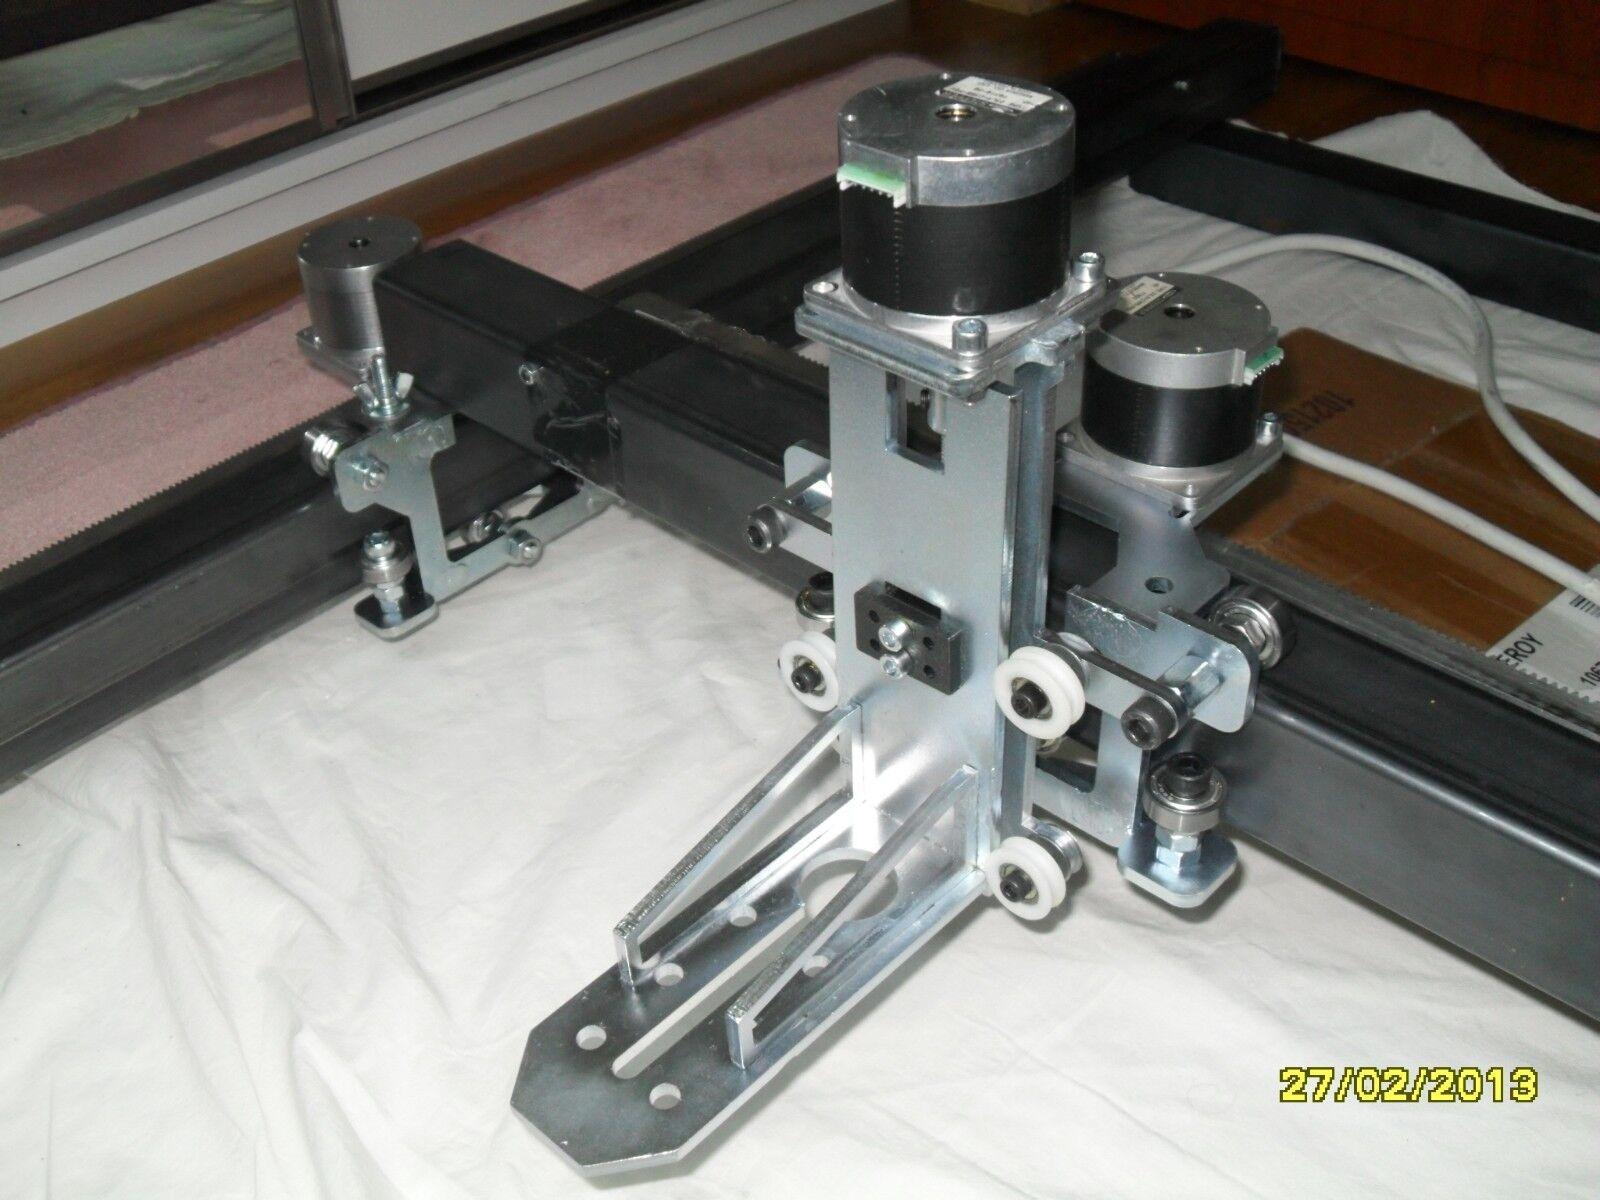 DIY CNC Plasma Cutter Kit for NEMA 23